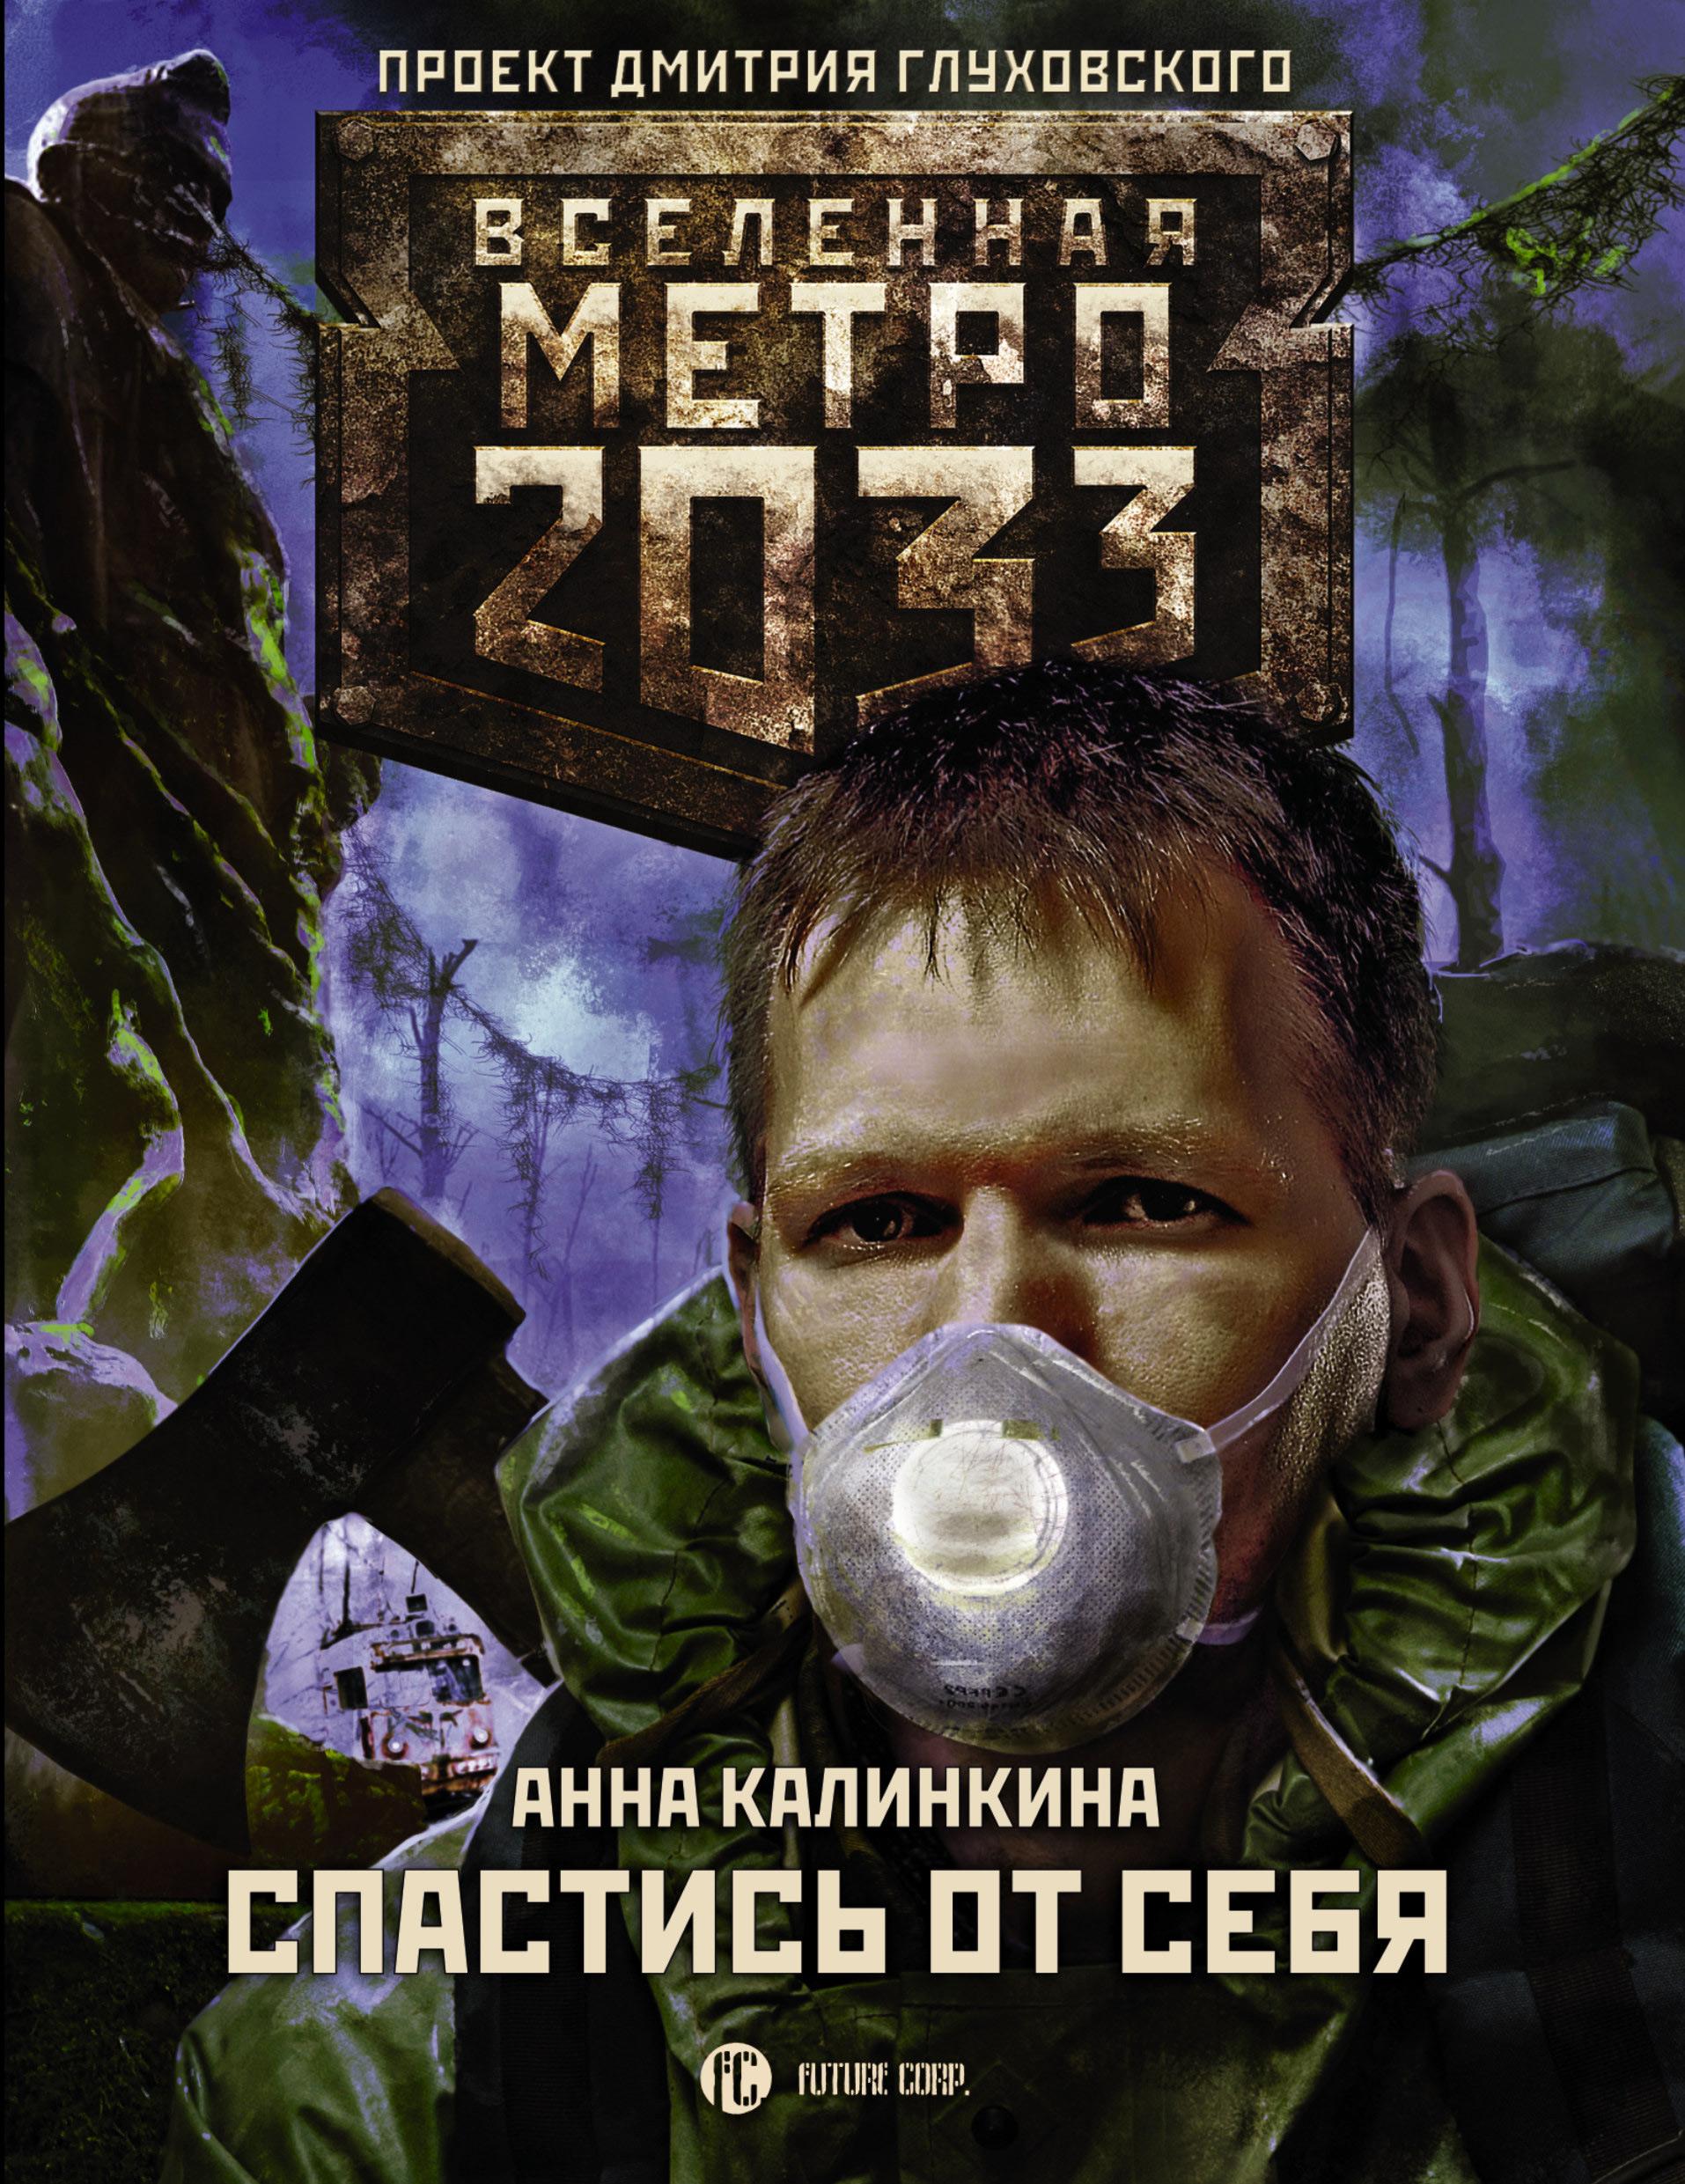 Метро 2033: Спастись от себя